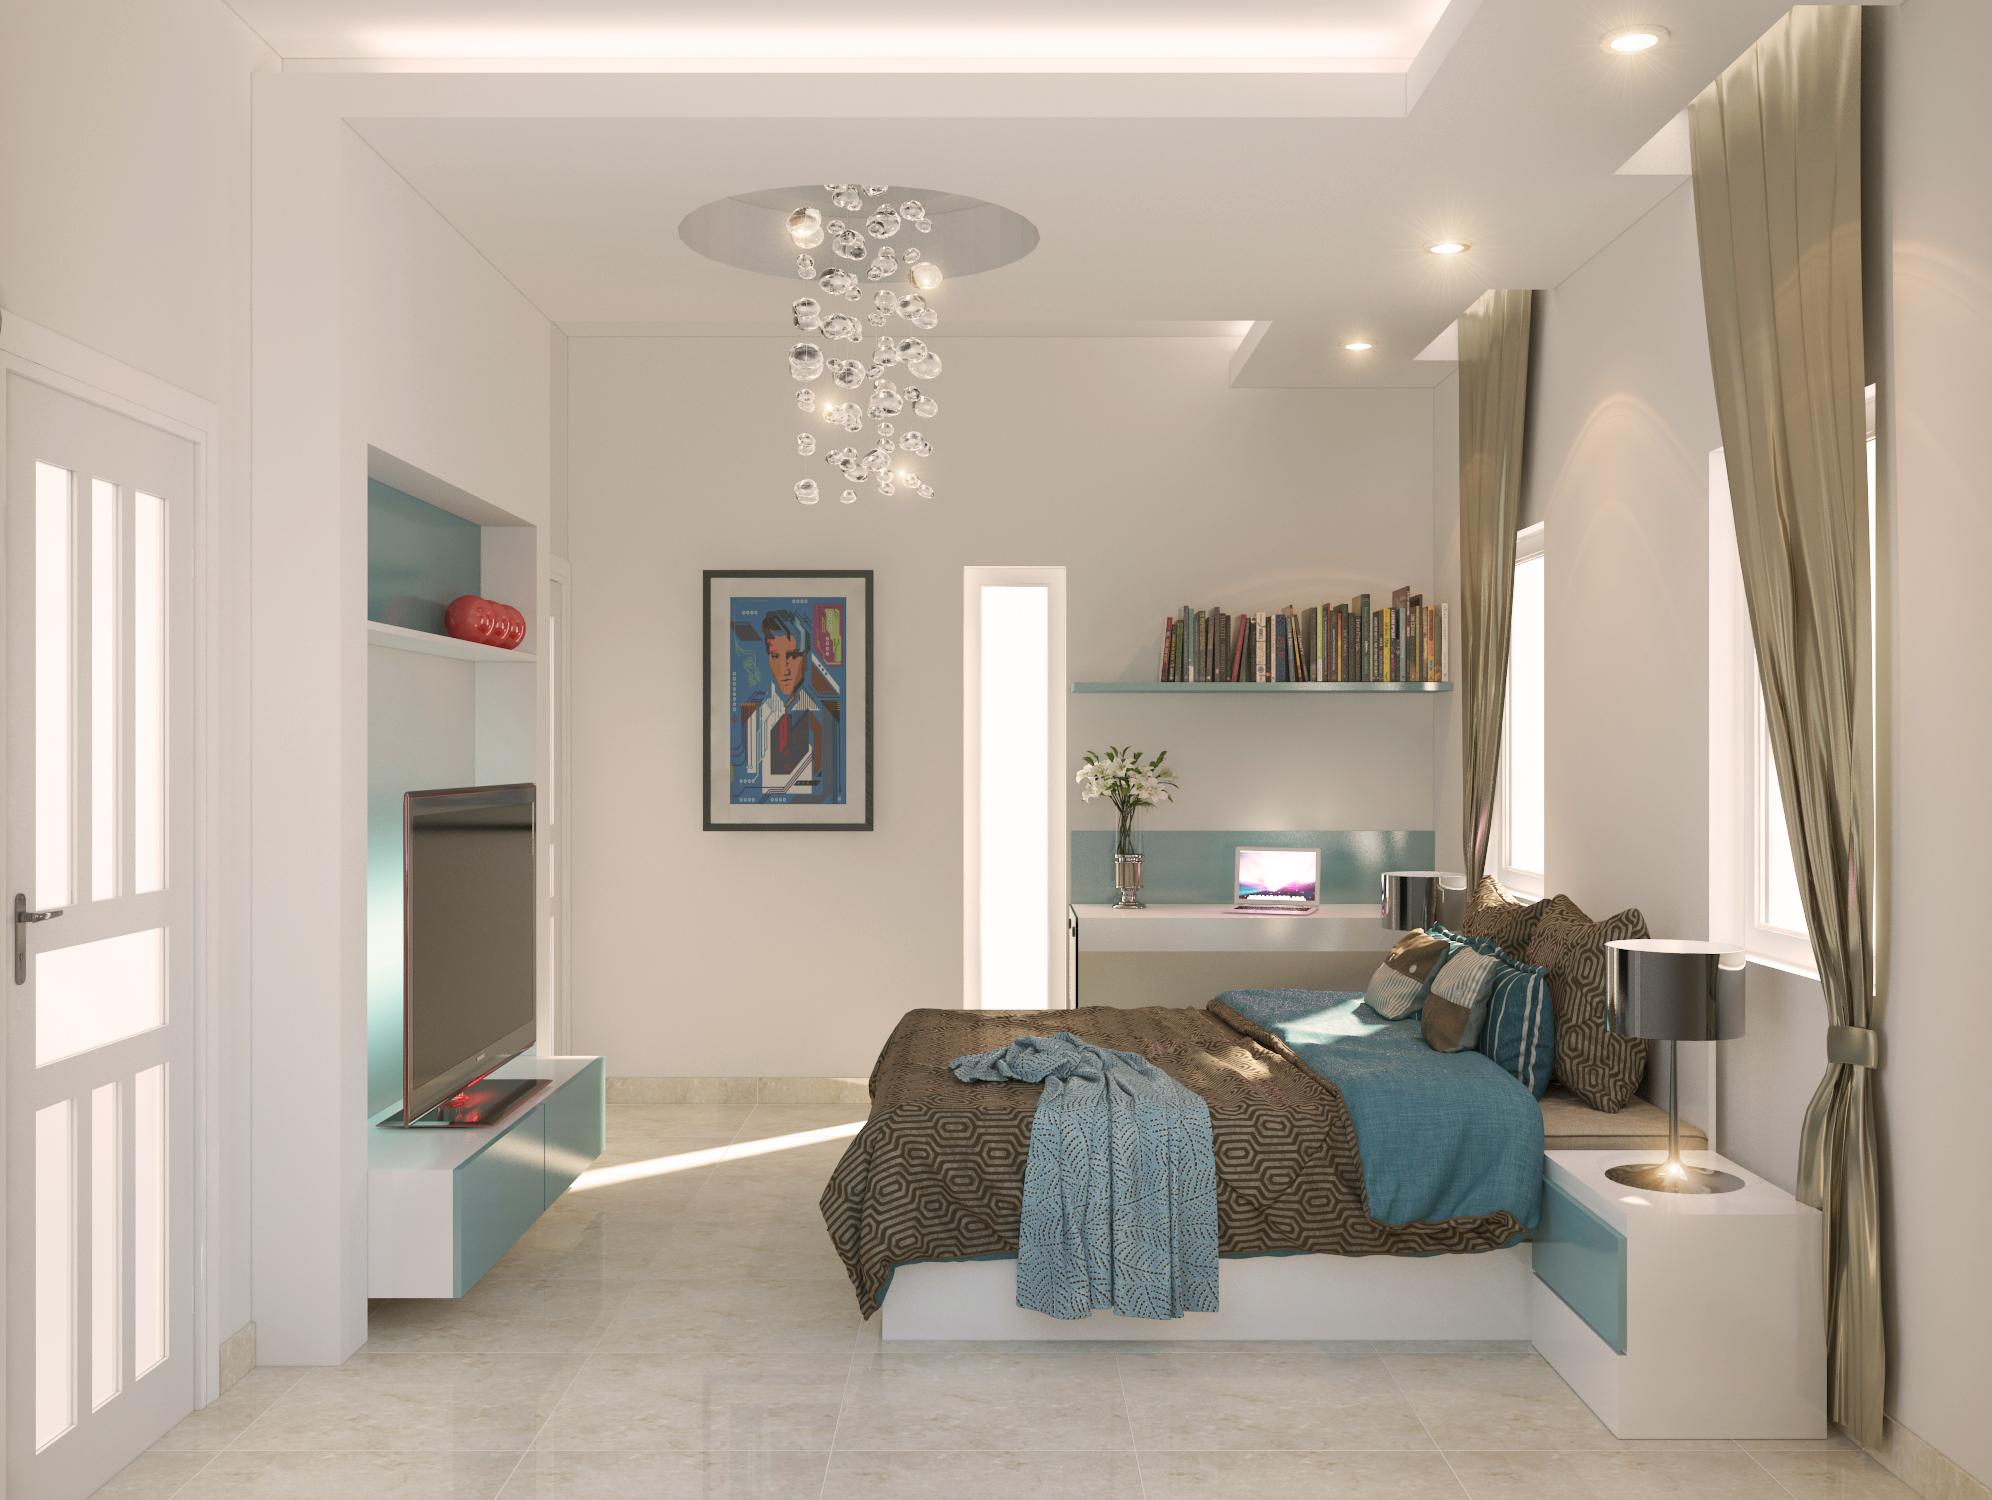 Bedroom First Floor Rear